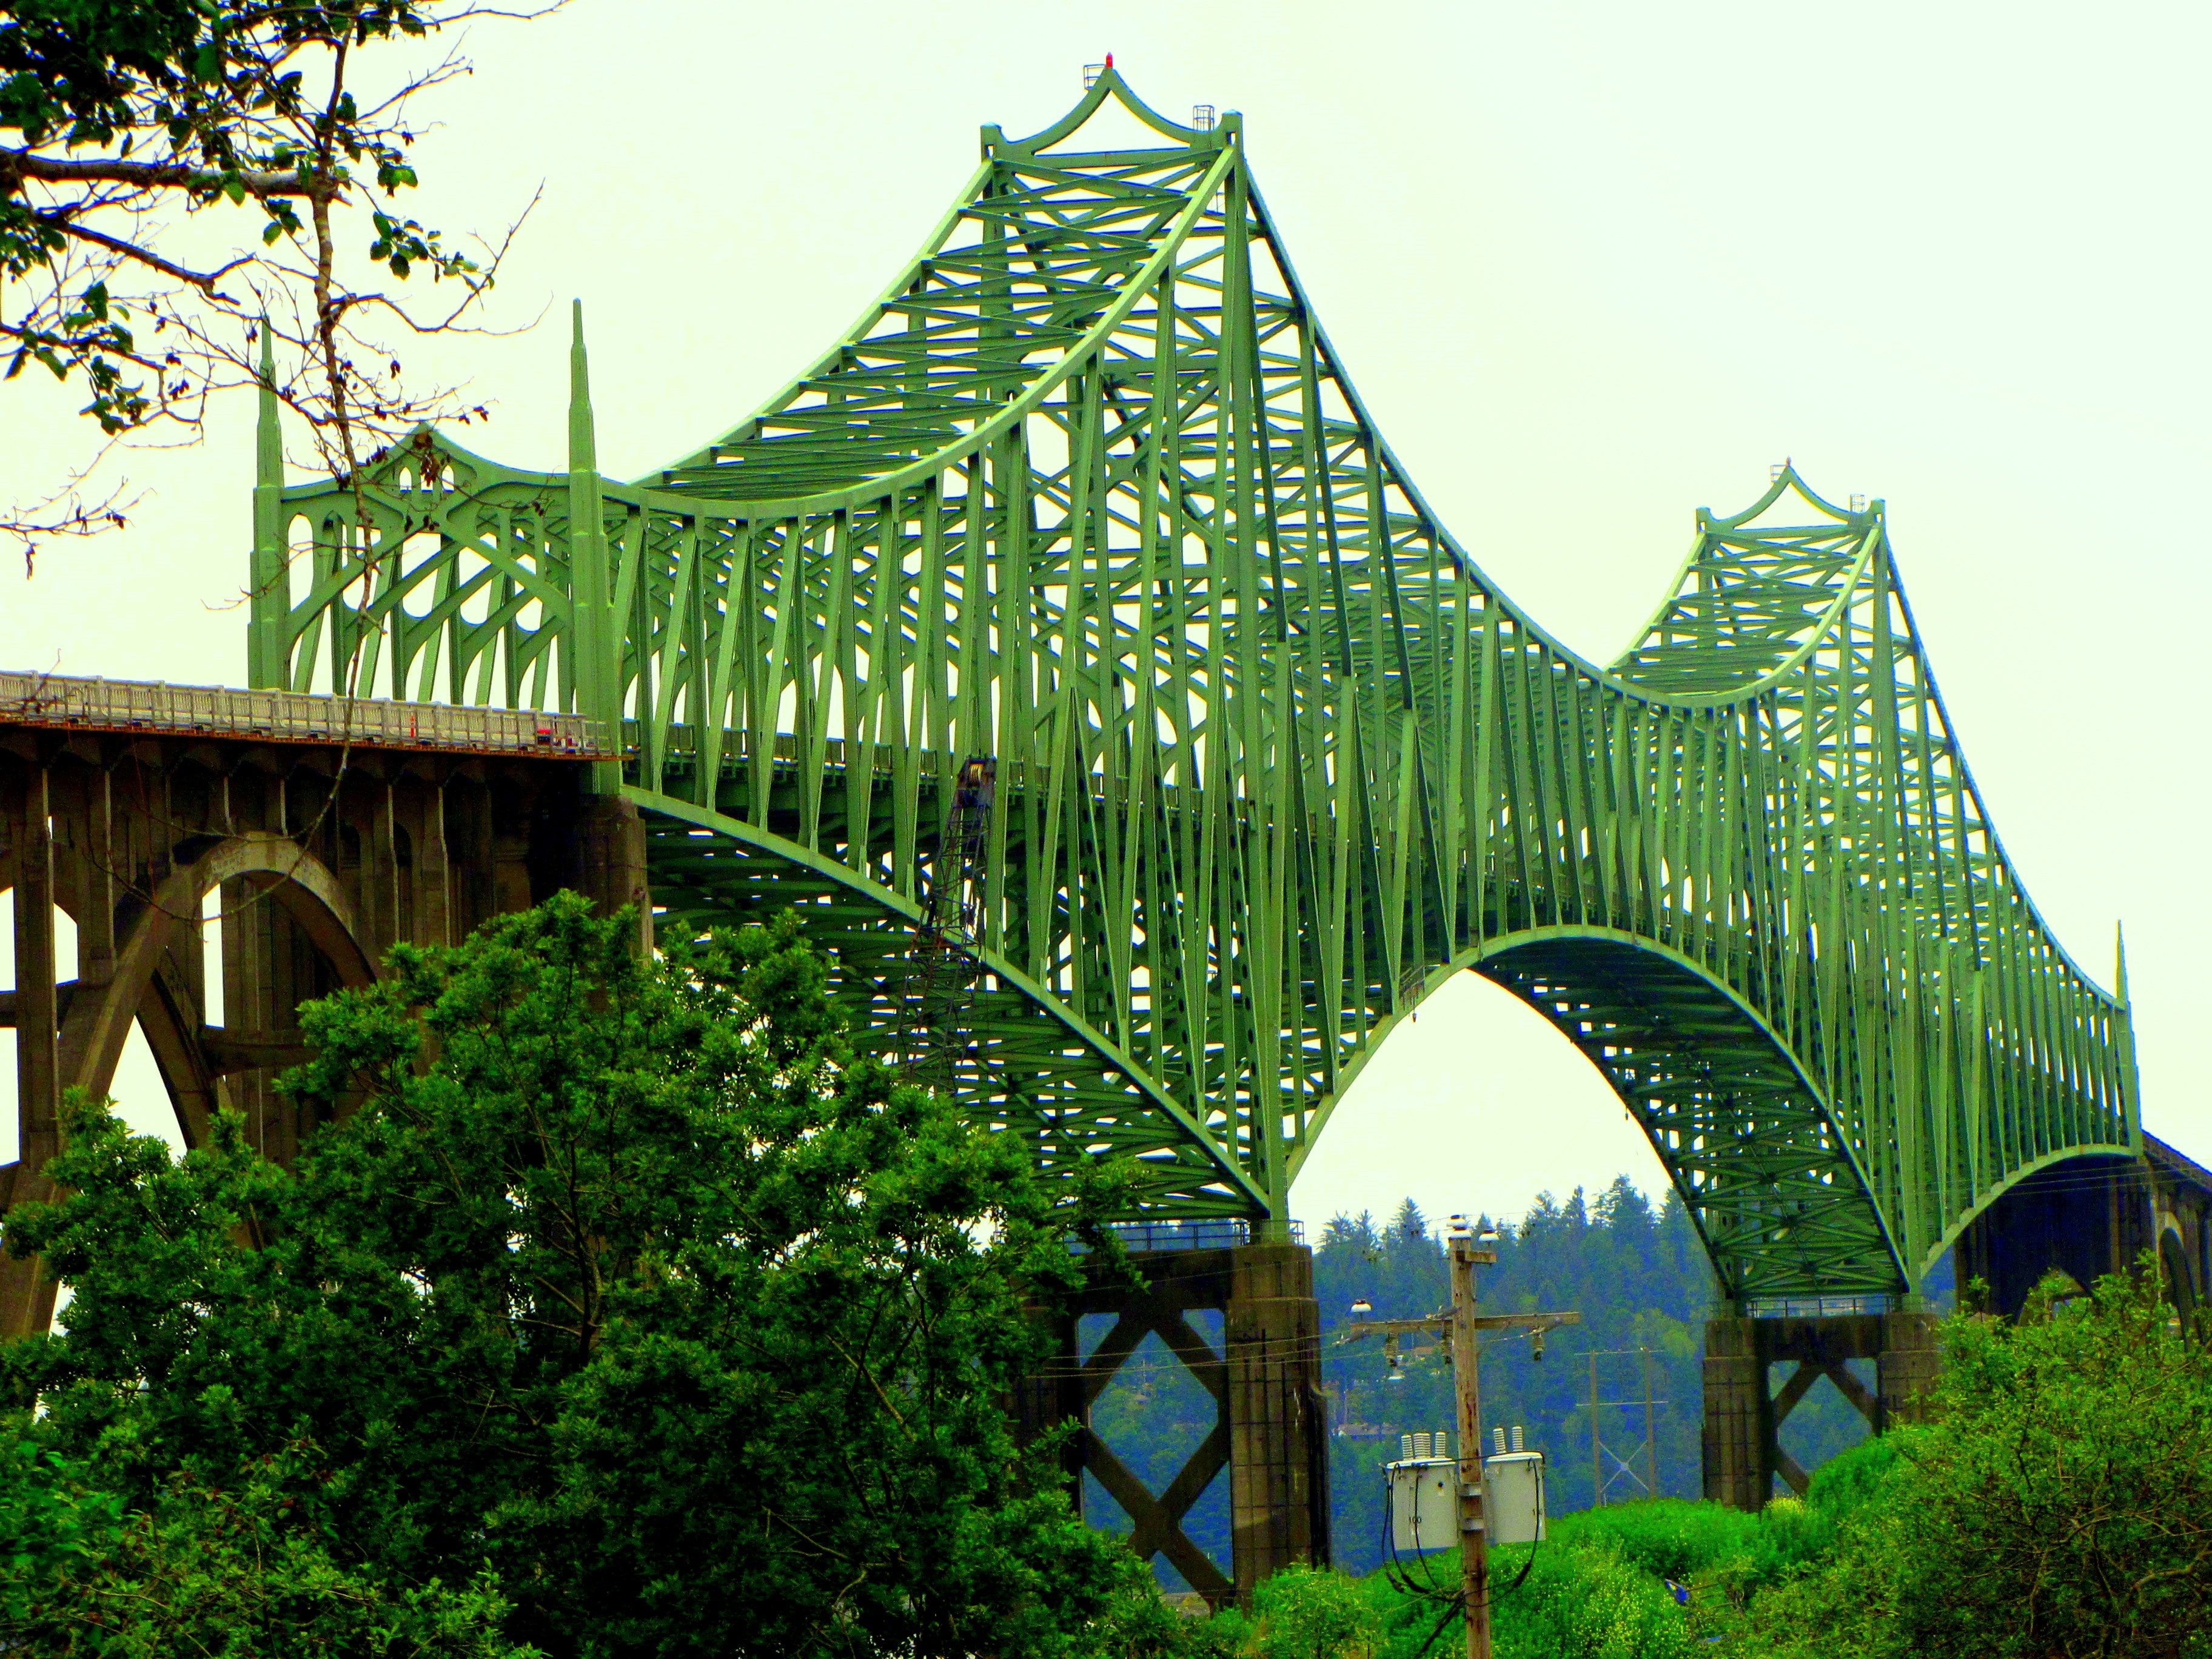 Map Of Oregon Highways%0A McCullough Memorial Bridge   North Bend  Oregon   ft   m   Part of the  Oregon Coast Highway  the bridge crosses Coos Bay